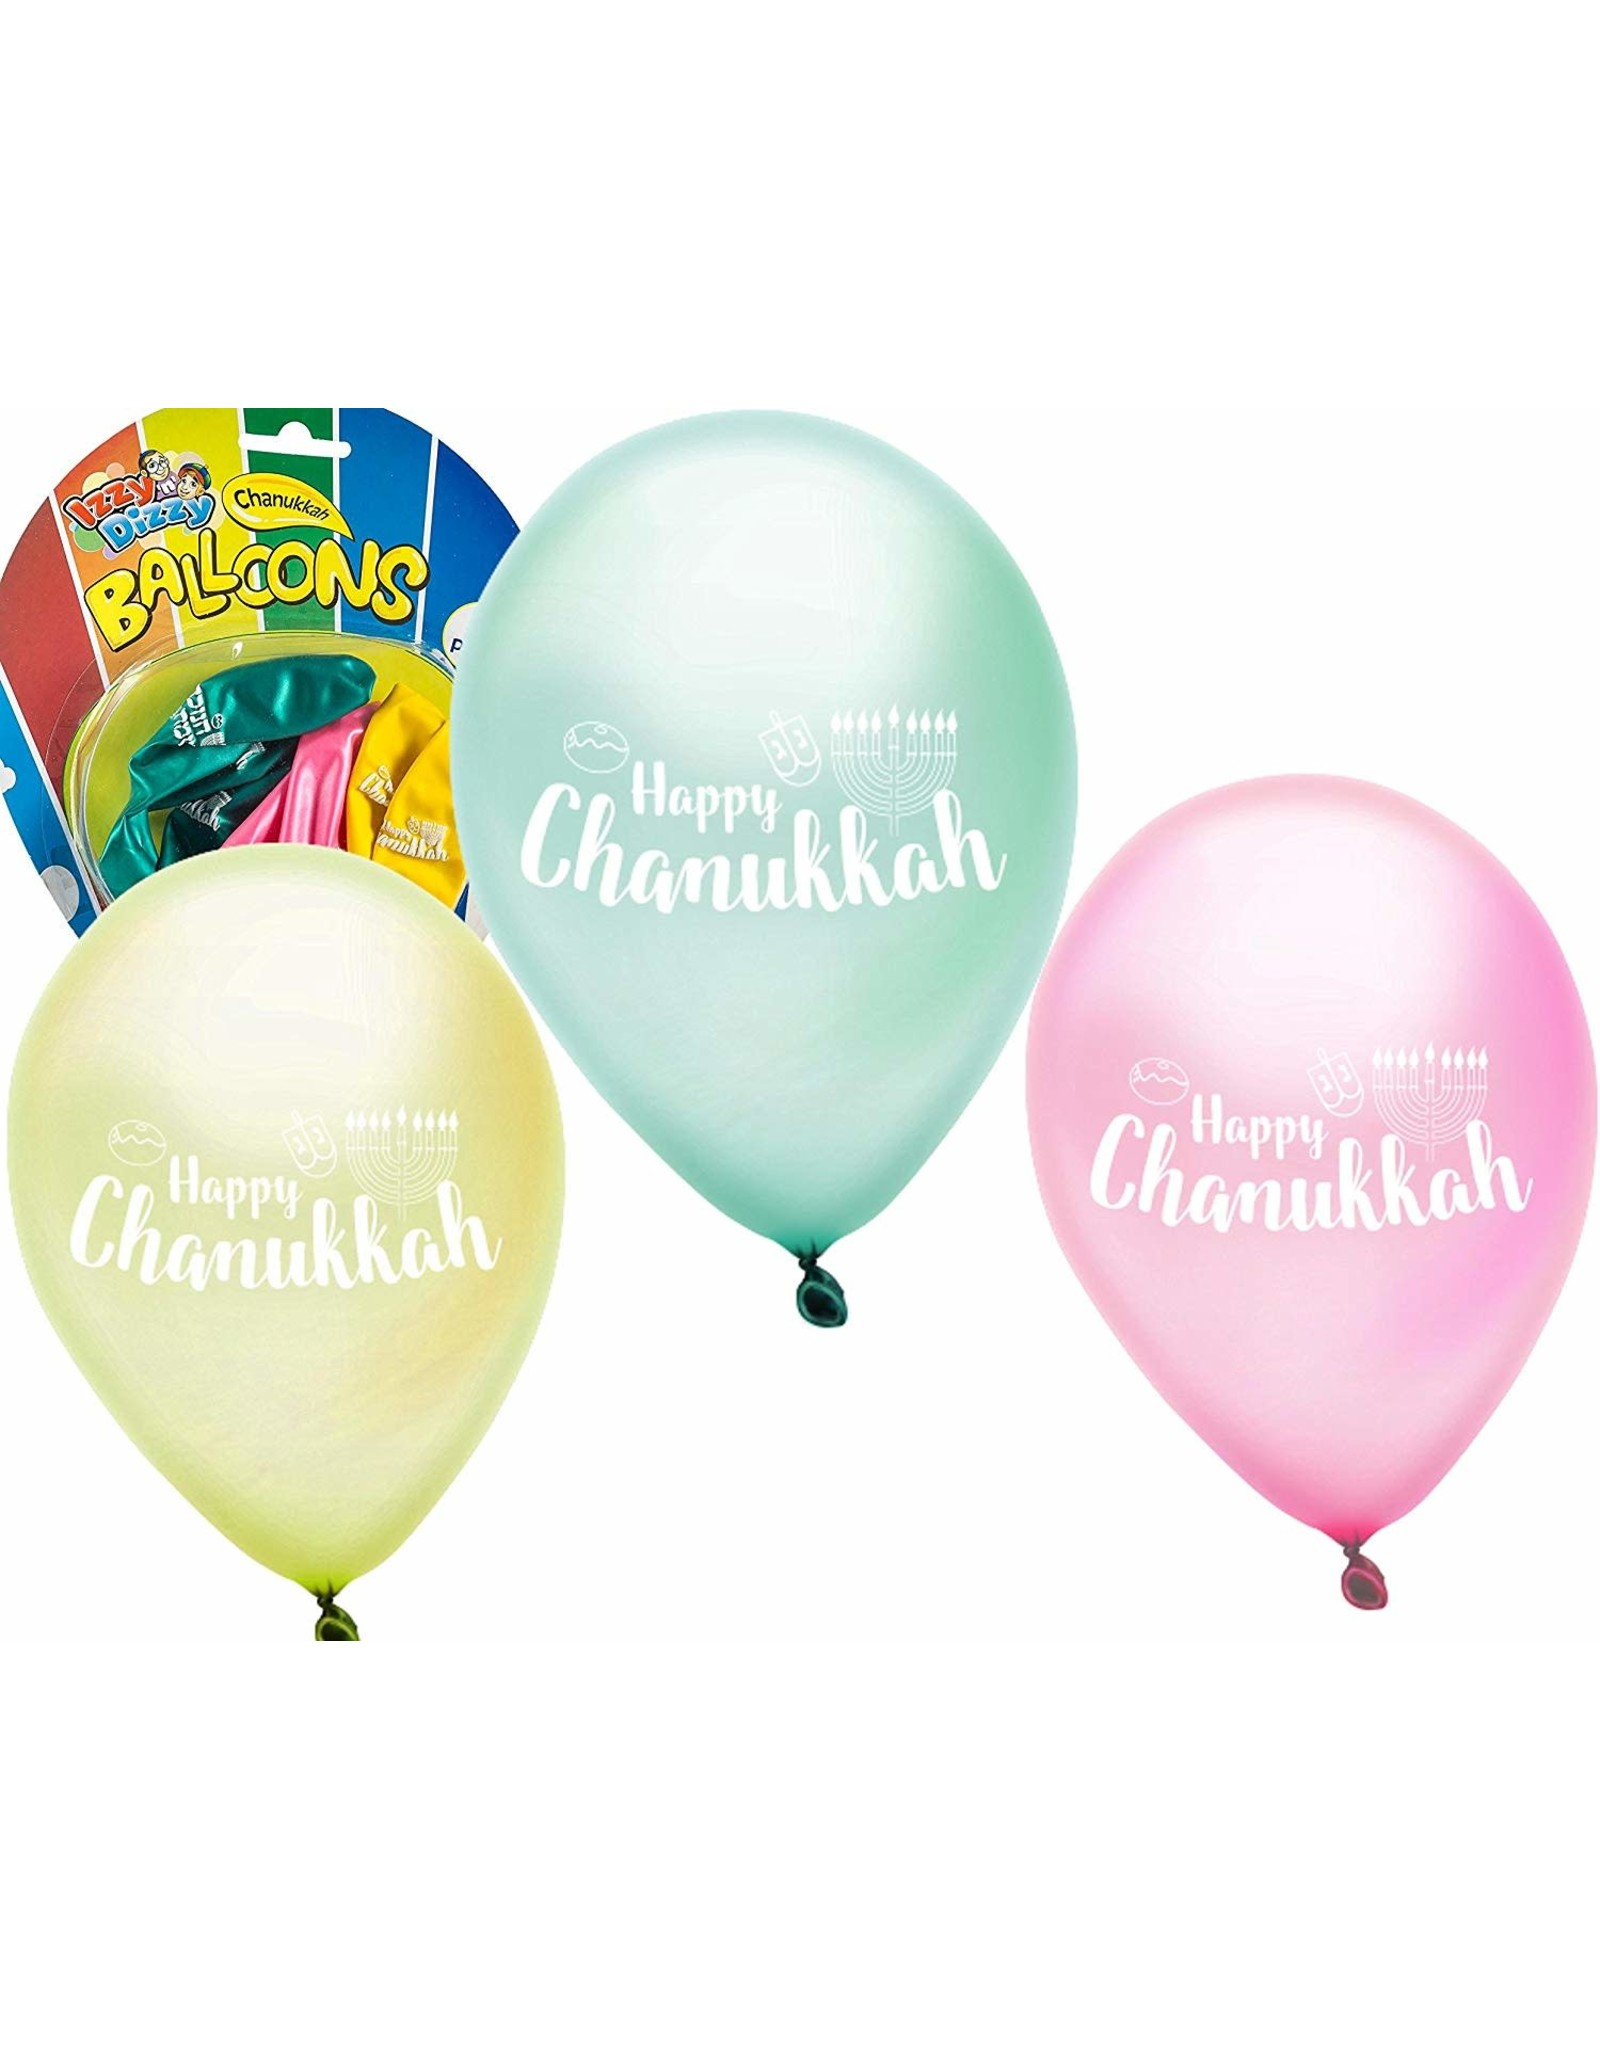 12 x Chanukah Balloons 6pk.